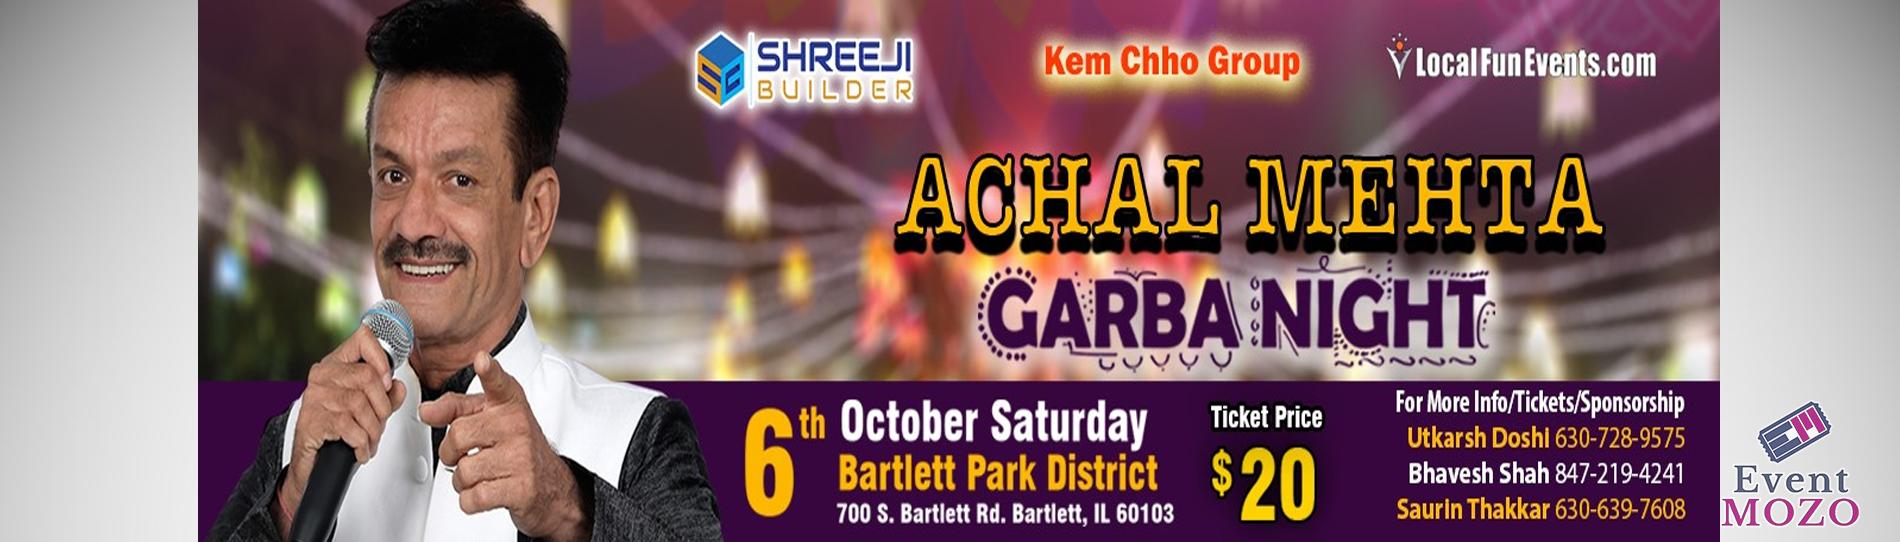 EventMozo Achal Mehta Garba 2018 - Chicago